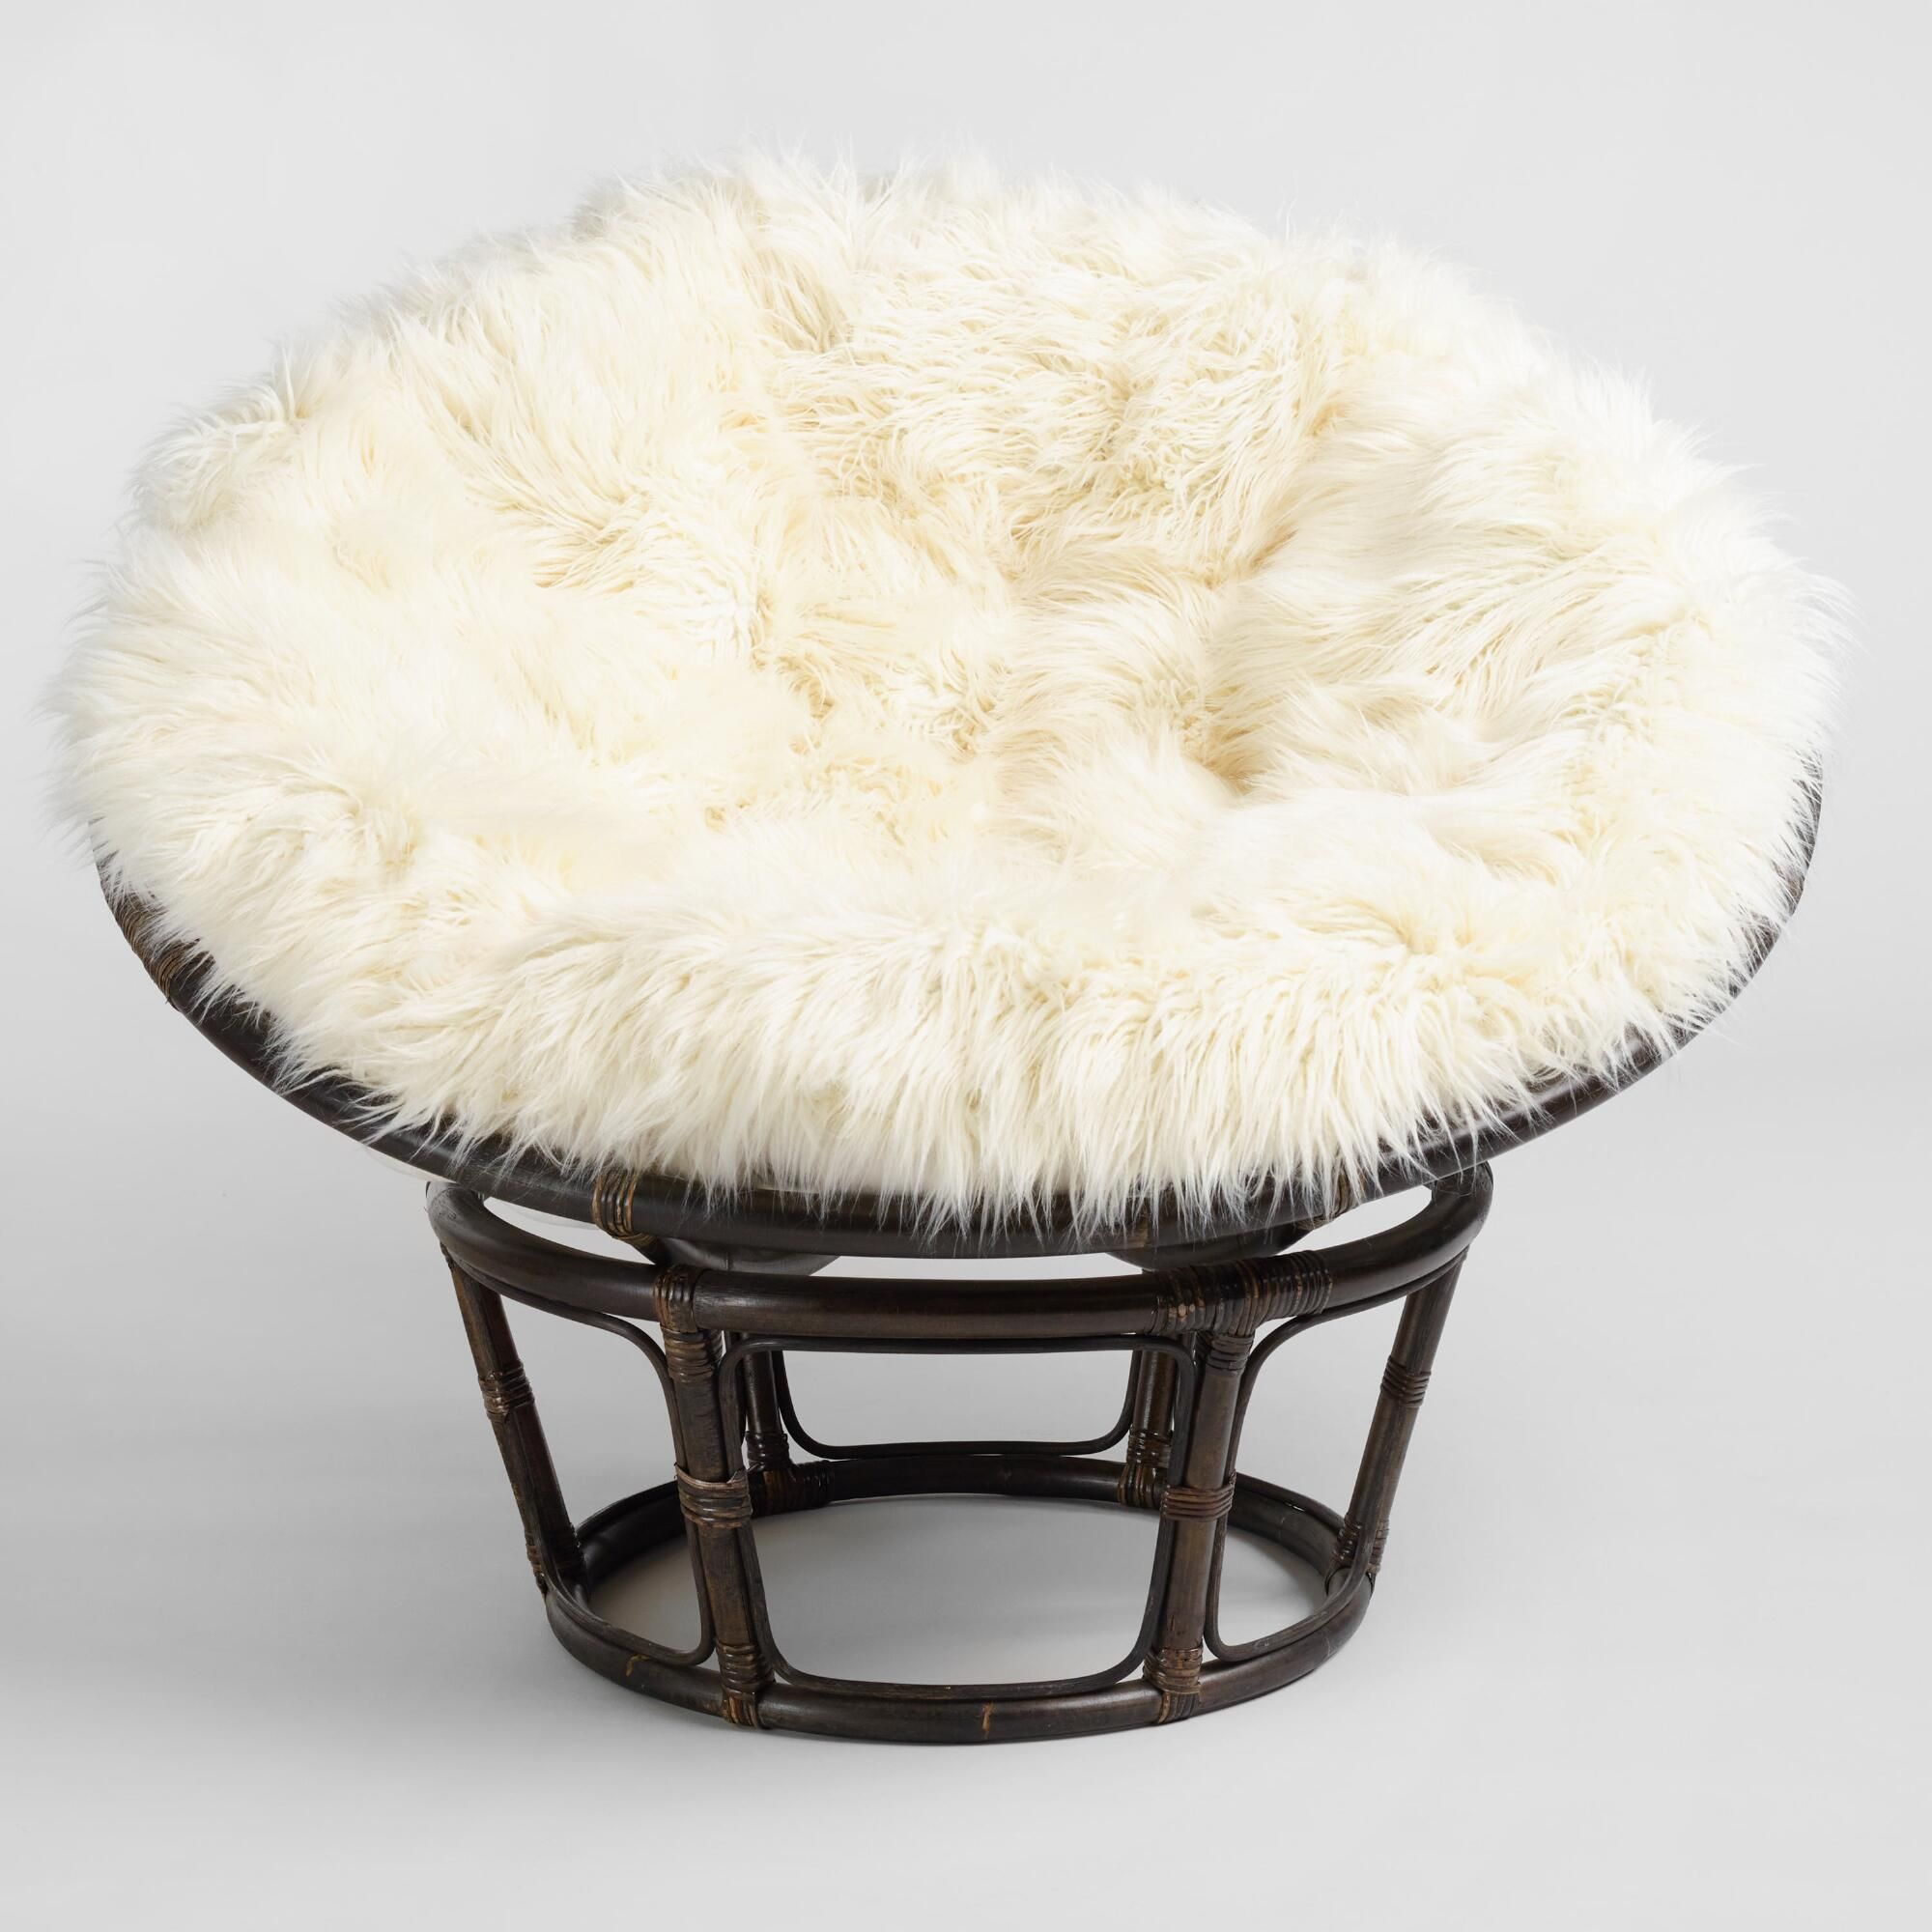 Remarkable Ivory Mongolian Faux Fur Papasan Cushion White Chair Alphanode Cool Chair Designs And Ideas Alphanodeonline